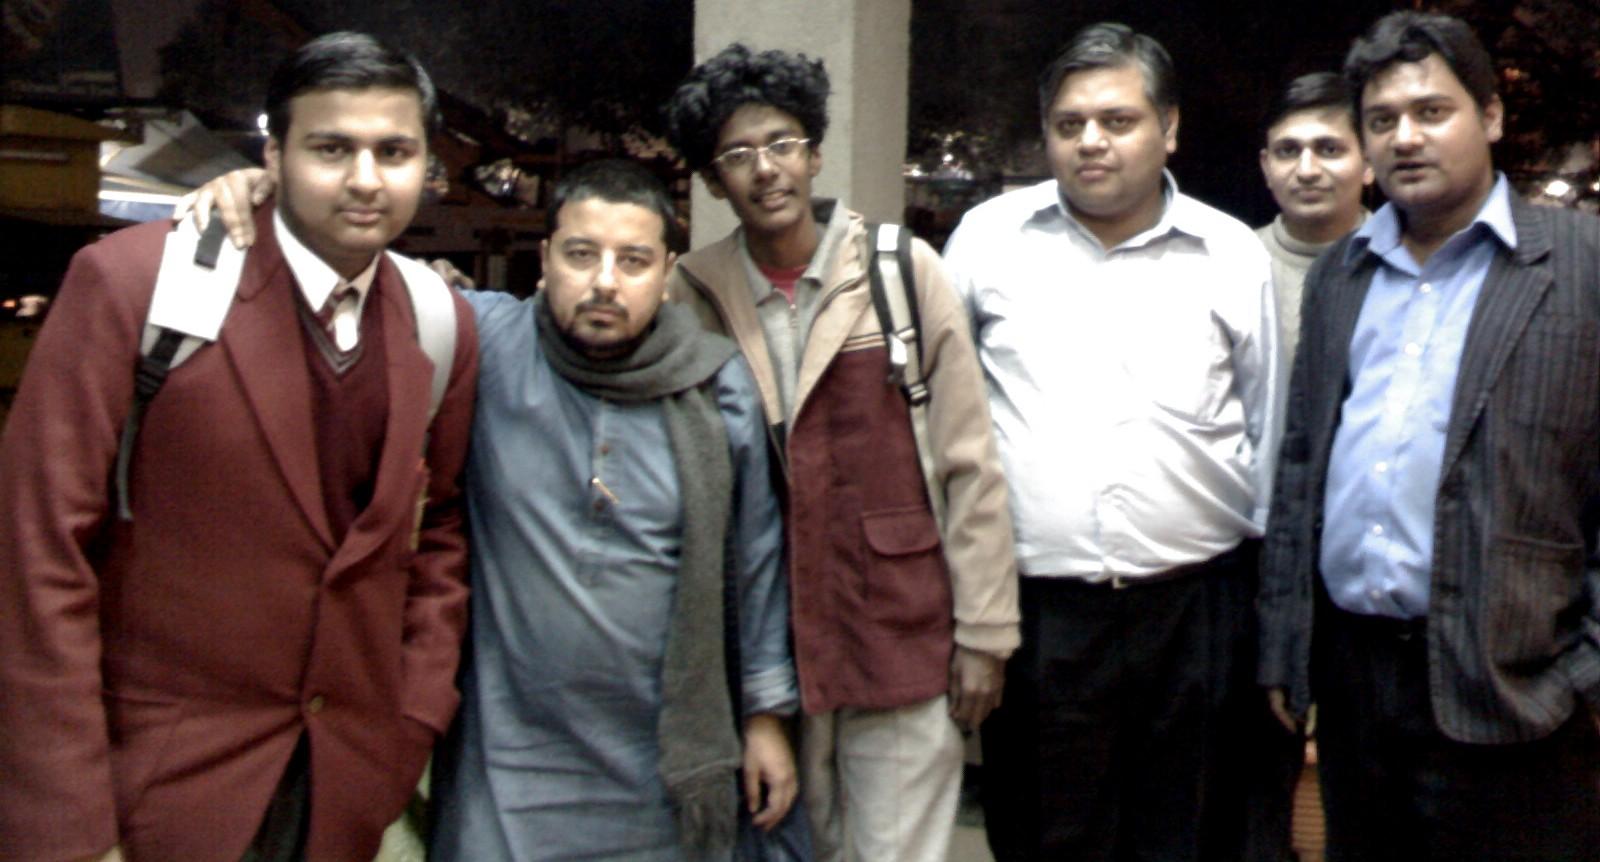 From L to R: Prateek Vijayavargia, Parnab Mukherjee, Jimi Hendrix (Prashanth), Arindam Bhattacharya (Cradle Sports), Unkown Cradle Sports Guy, Anirudh Sharma (Cradle Sports)